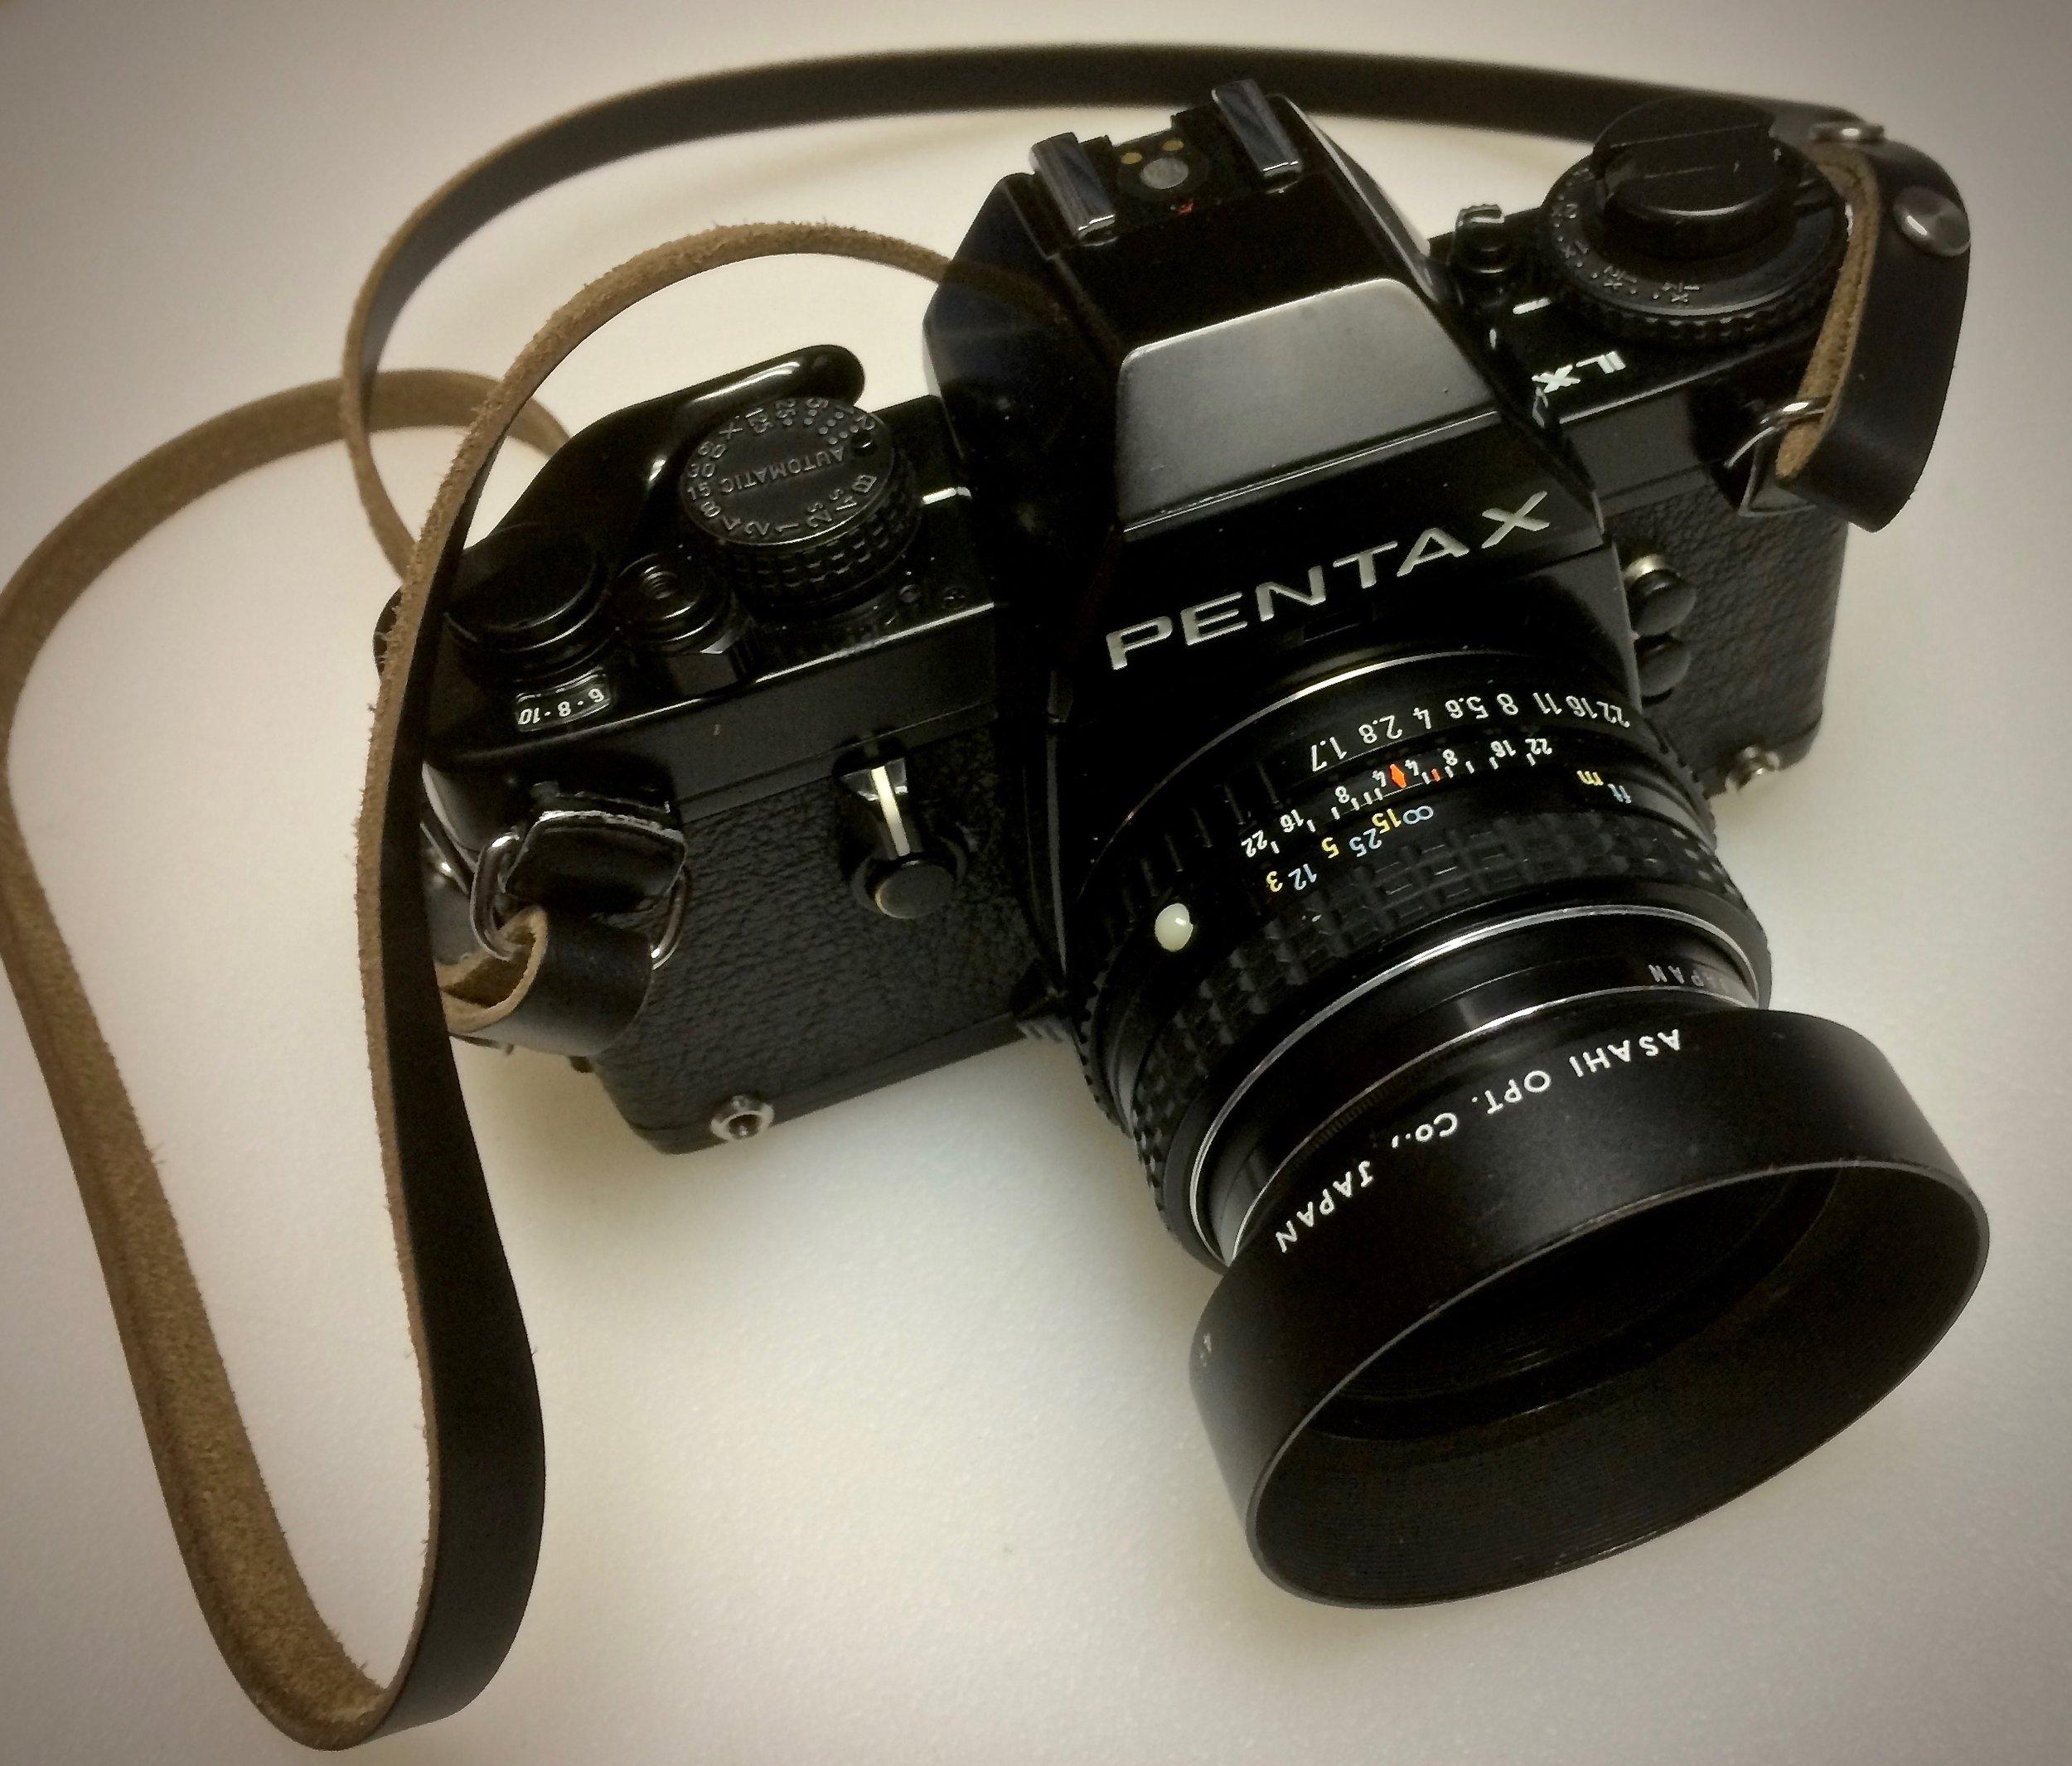 Pentax LX with SMC Pentax-M 50mm f/1.7